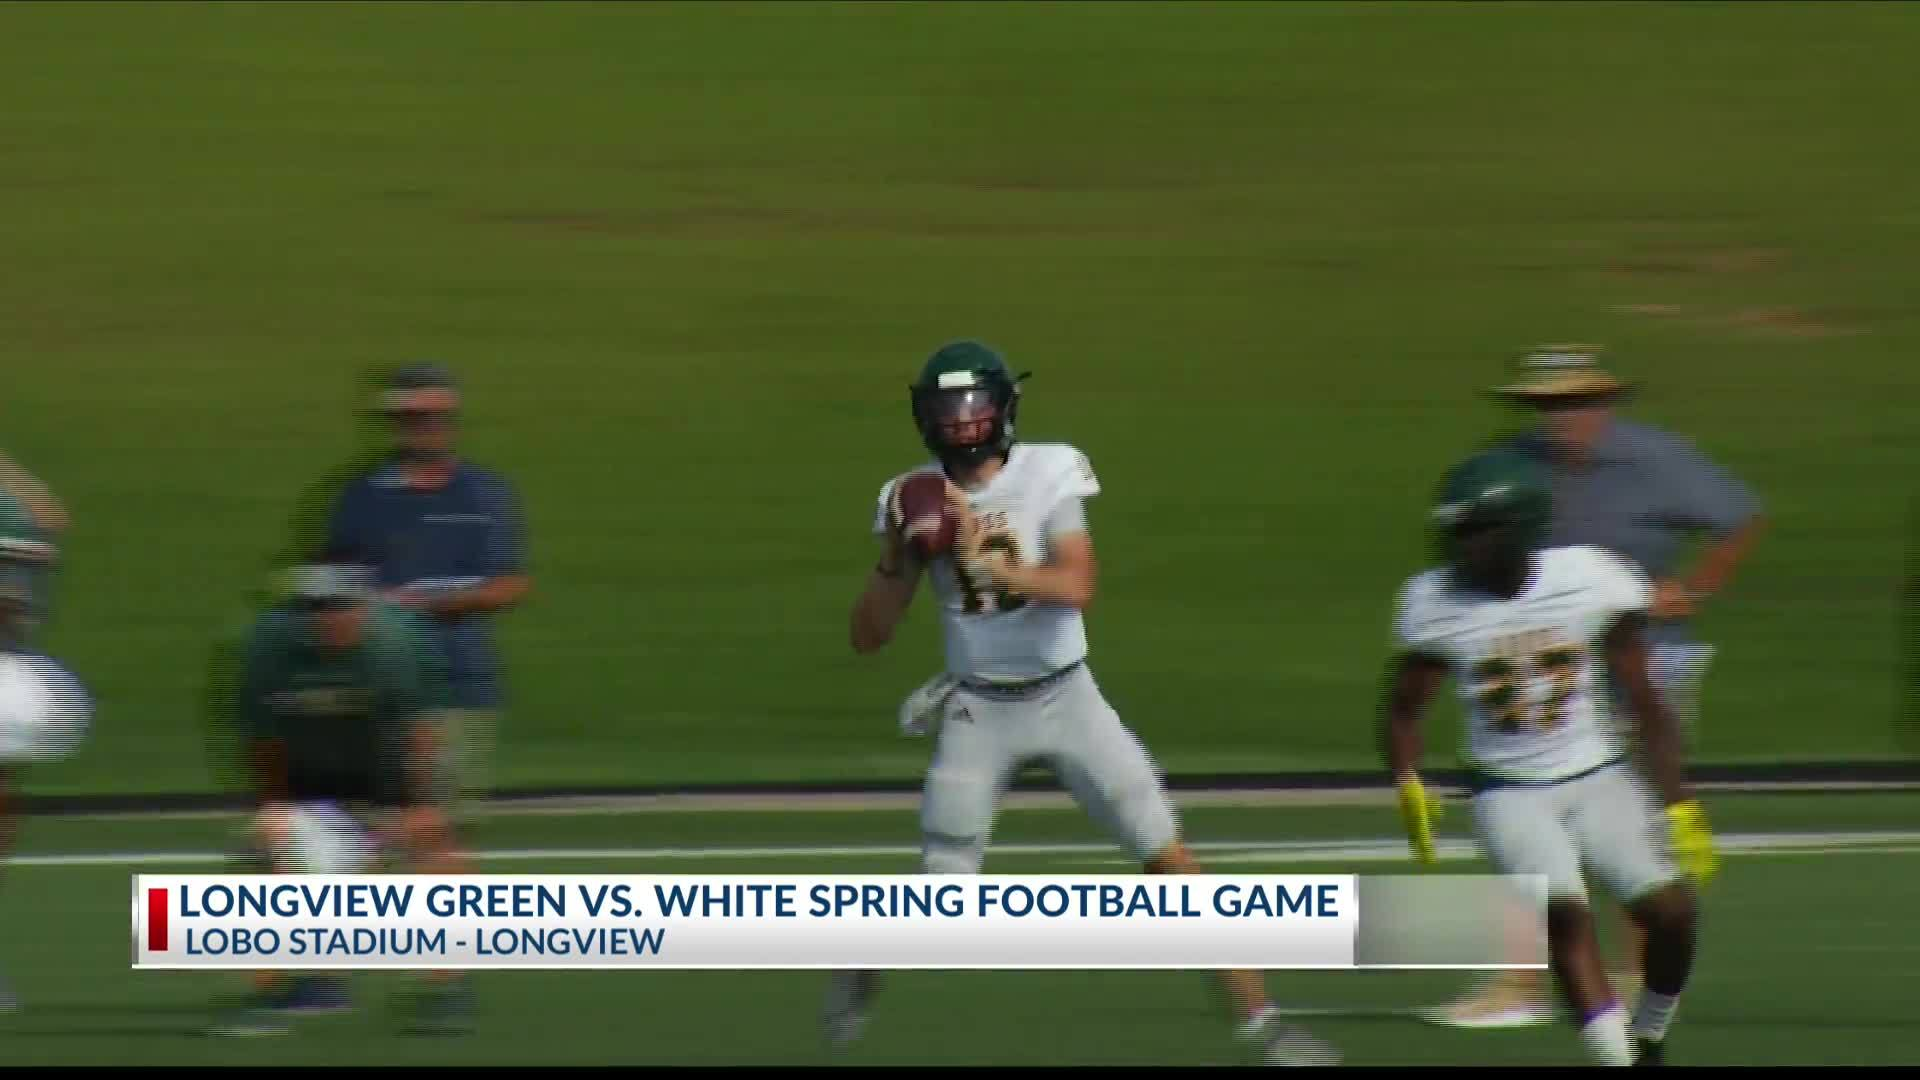 Longview_green_white_spring_football_gam_8_20190521034331